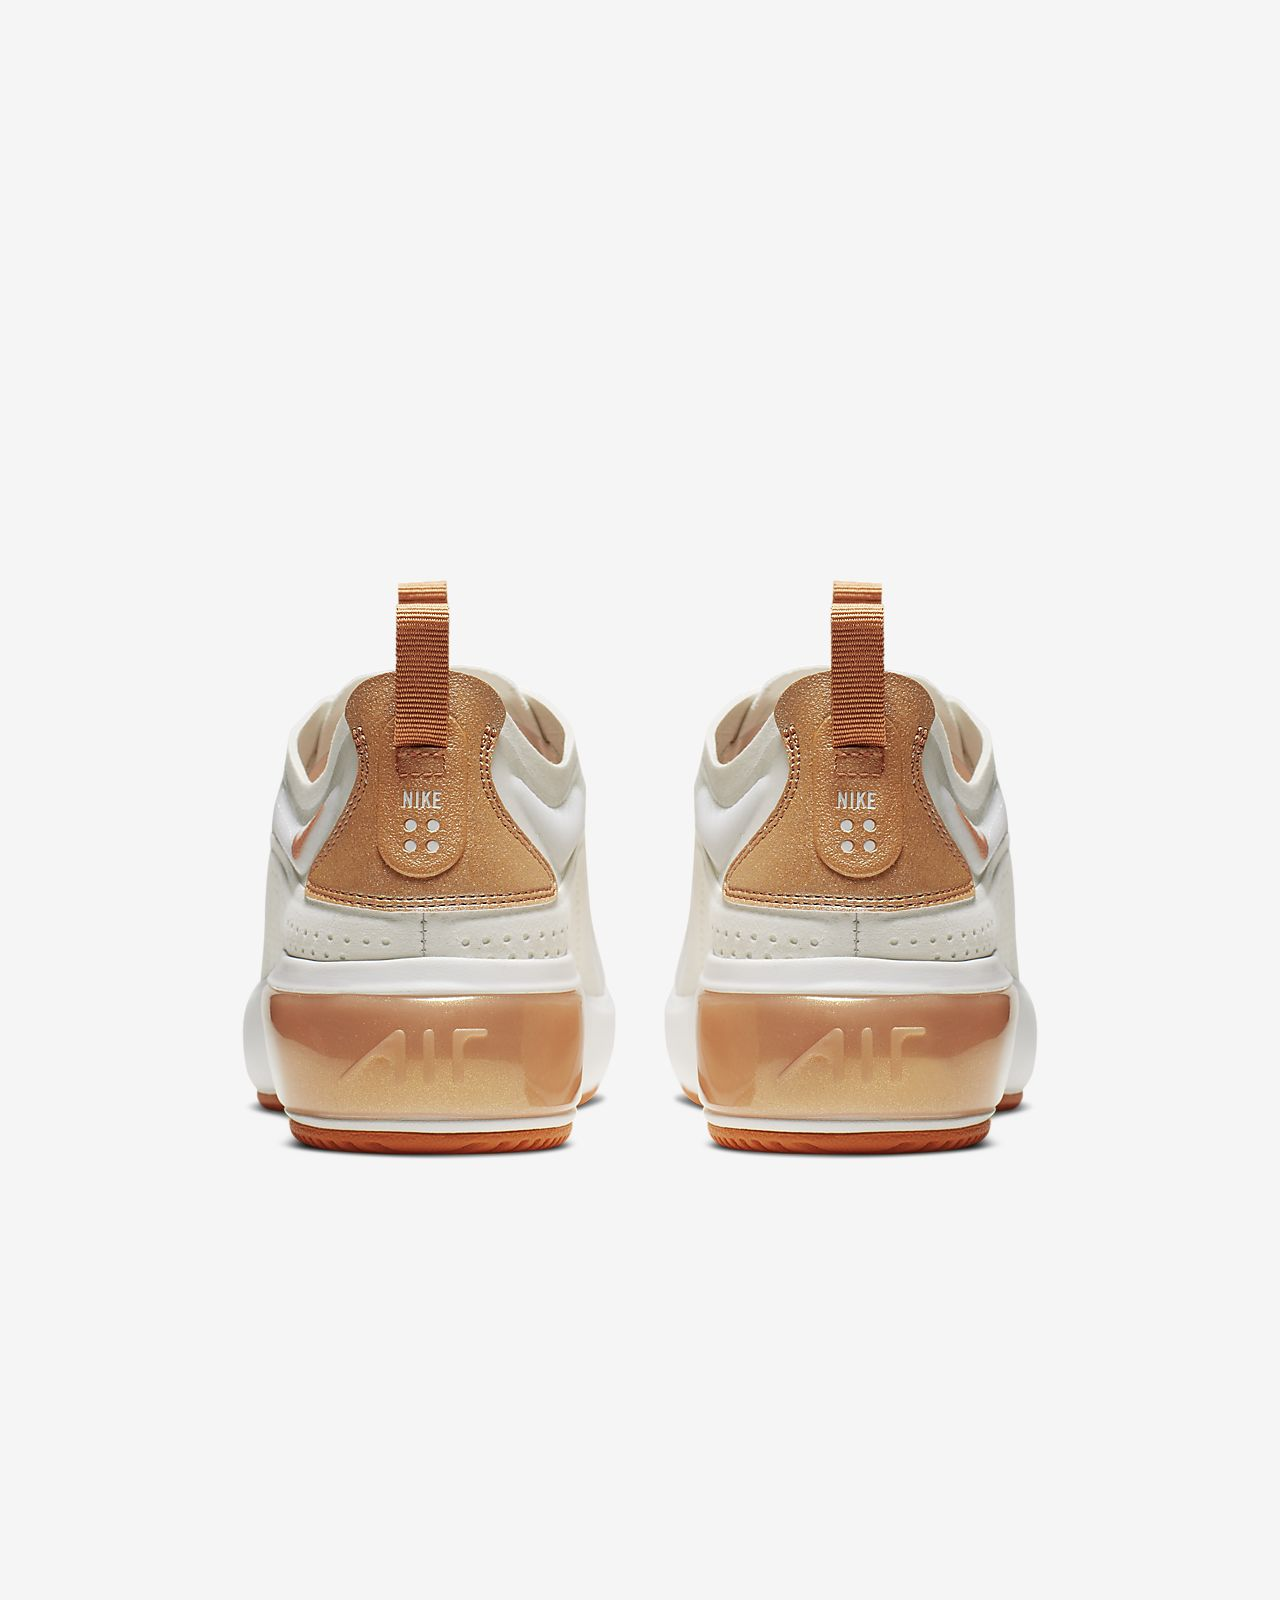 Nike Blazer Low LX Women's Shoe Size 8.5 (Summit White